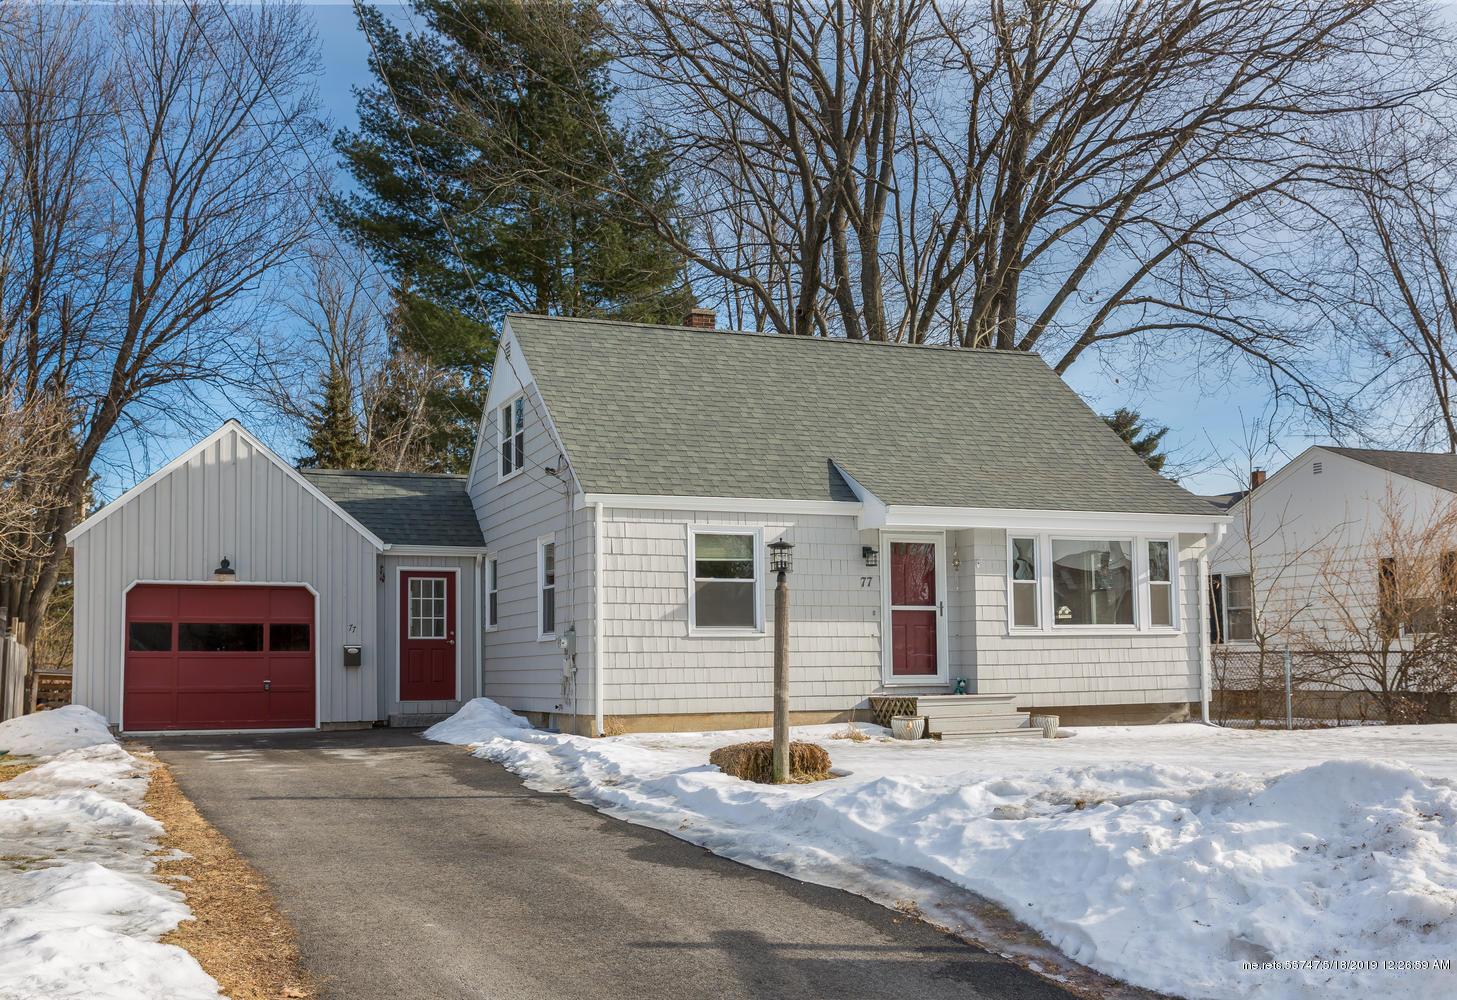 Nasons Corner Homes And Condos For Sale Portland Maine Real Estate